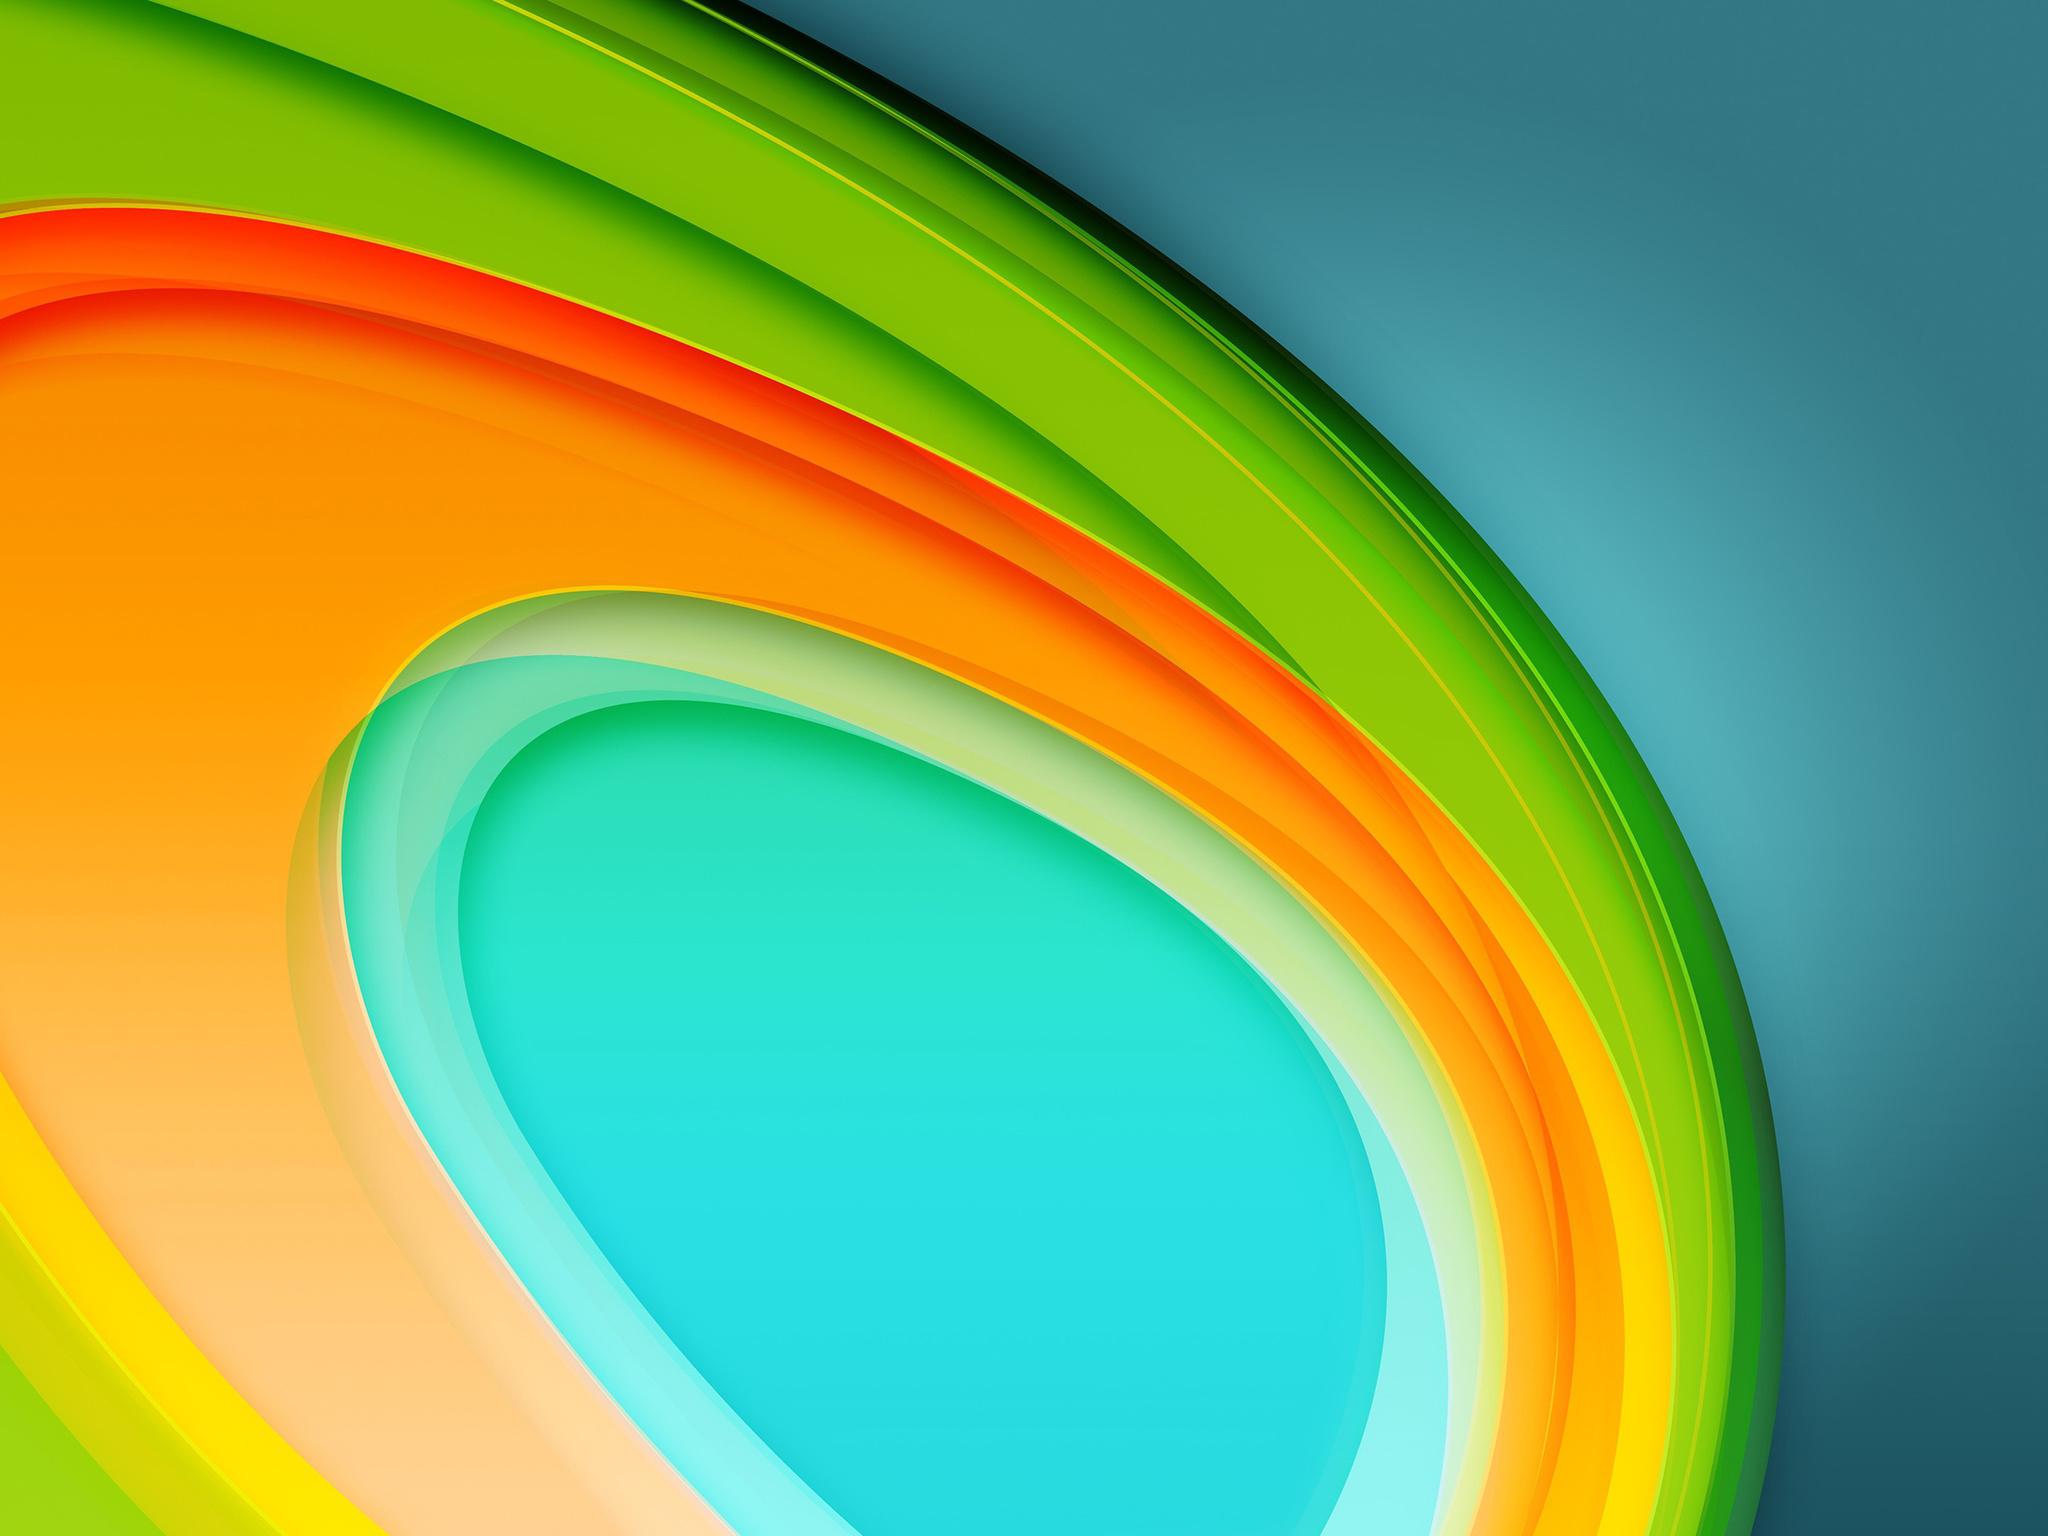 Colorful Circles 4K 5K (2048x1536)